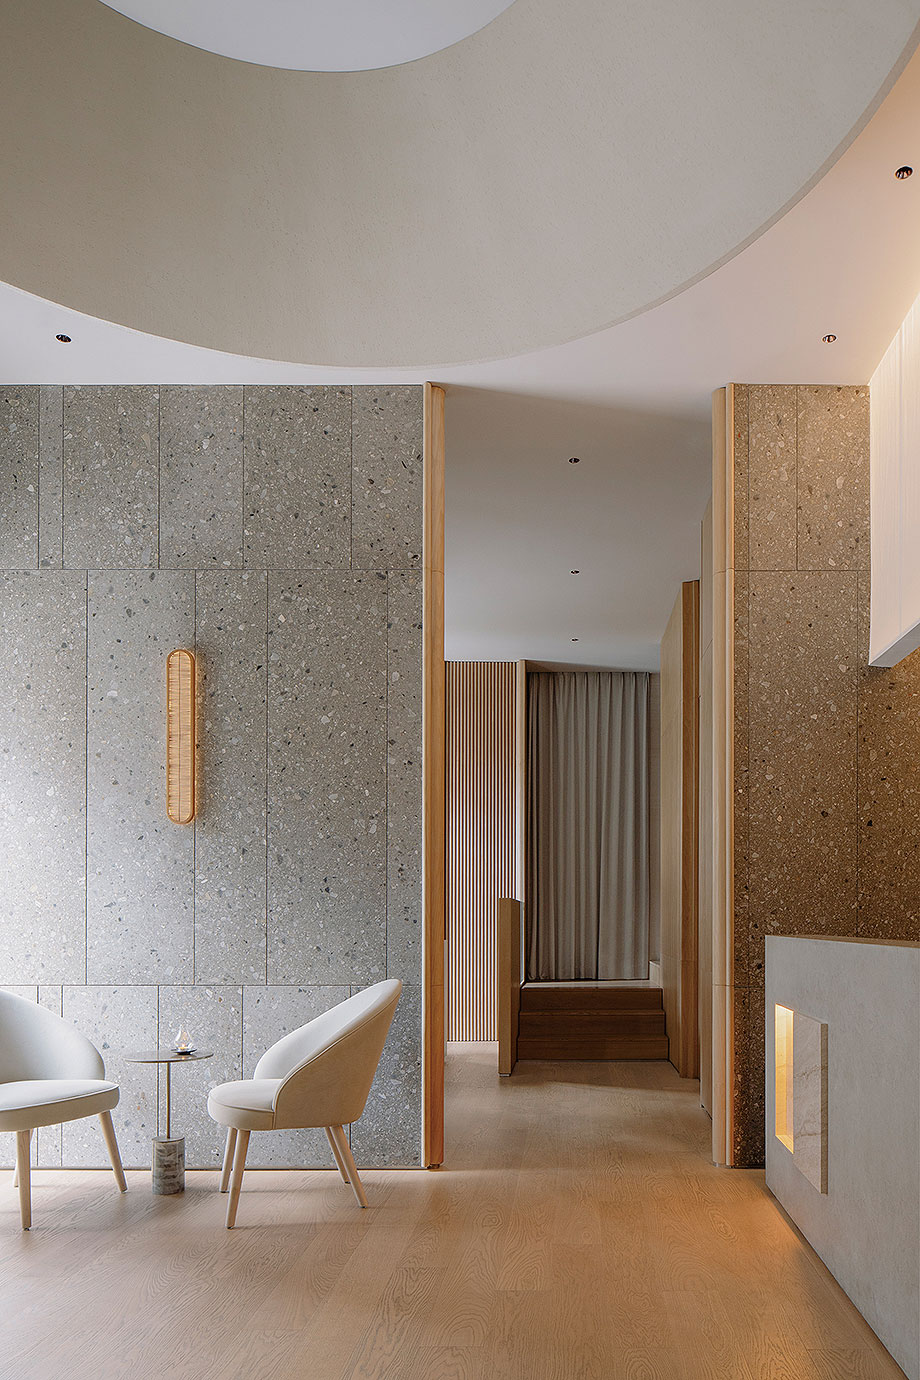 restaurante lunar en shanghai de so studio (3) - foto wen studio